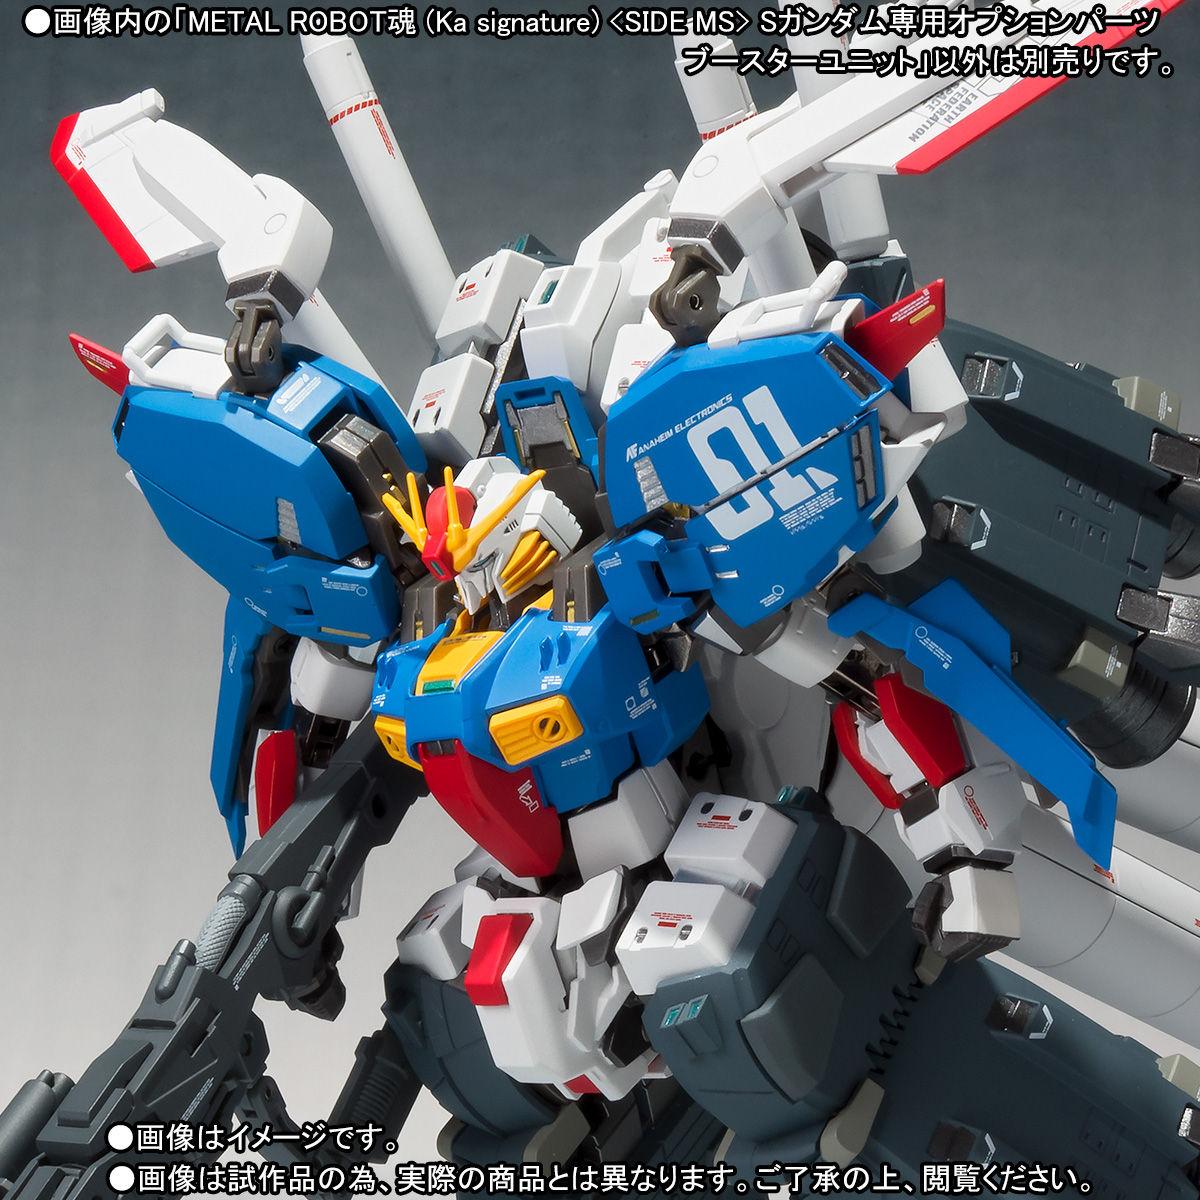 METAL ROBOT魂(Ka signature)<SIDE MS>『Sガンダム専用オプションパーツ ブースターユニット』オプションパーツ-001